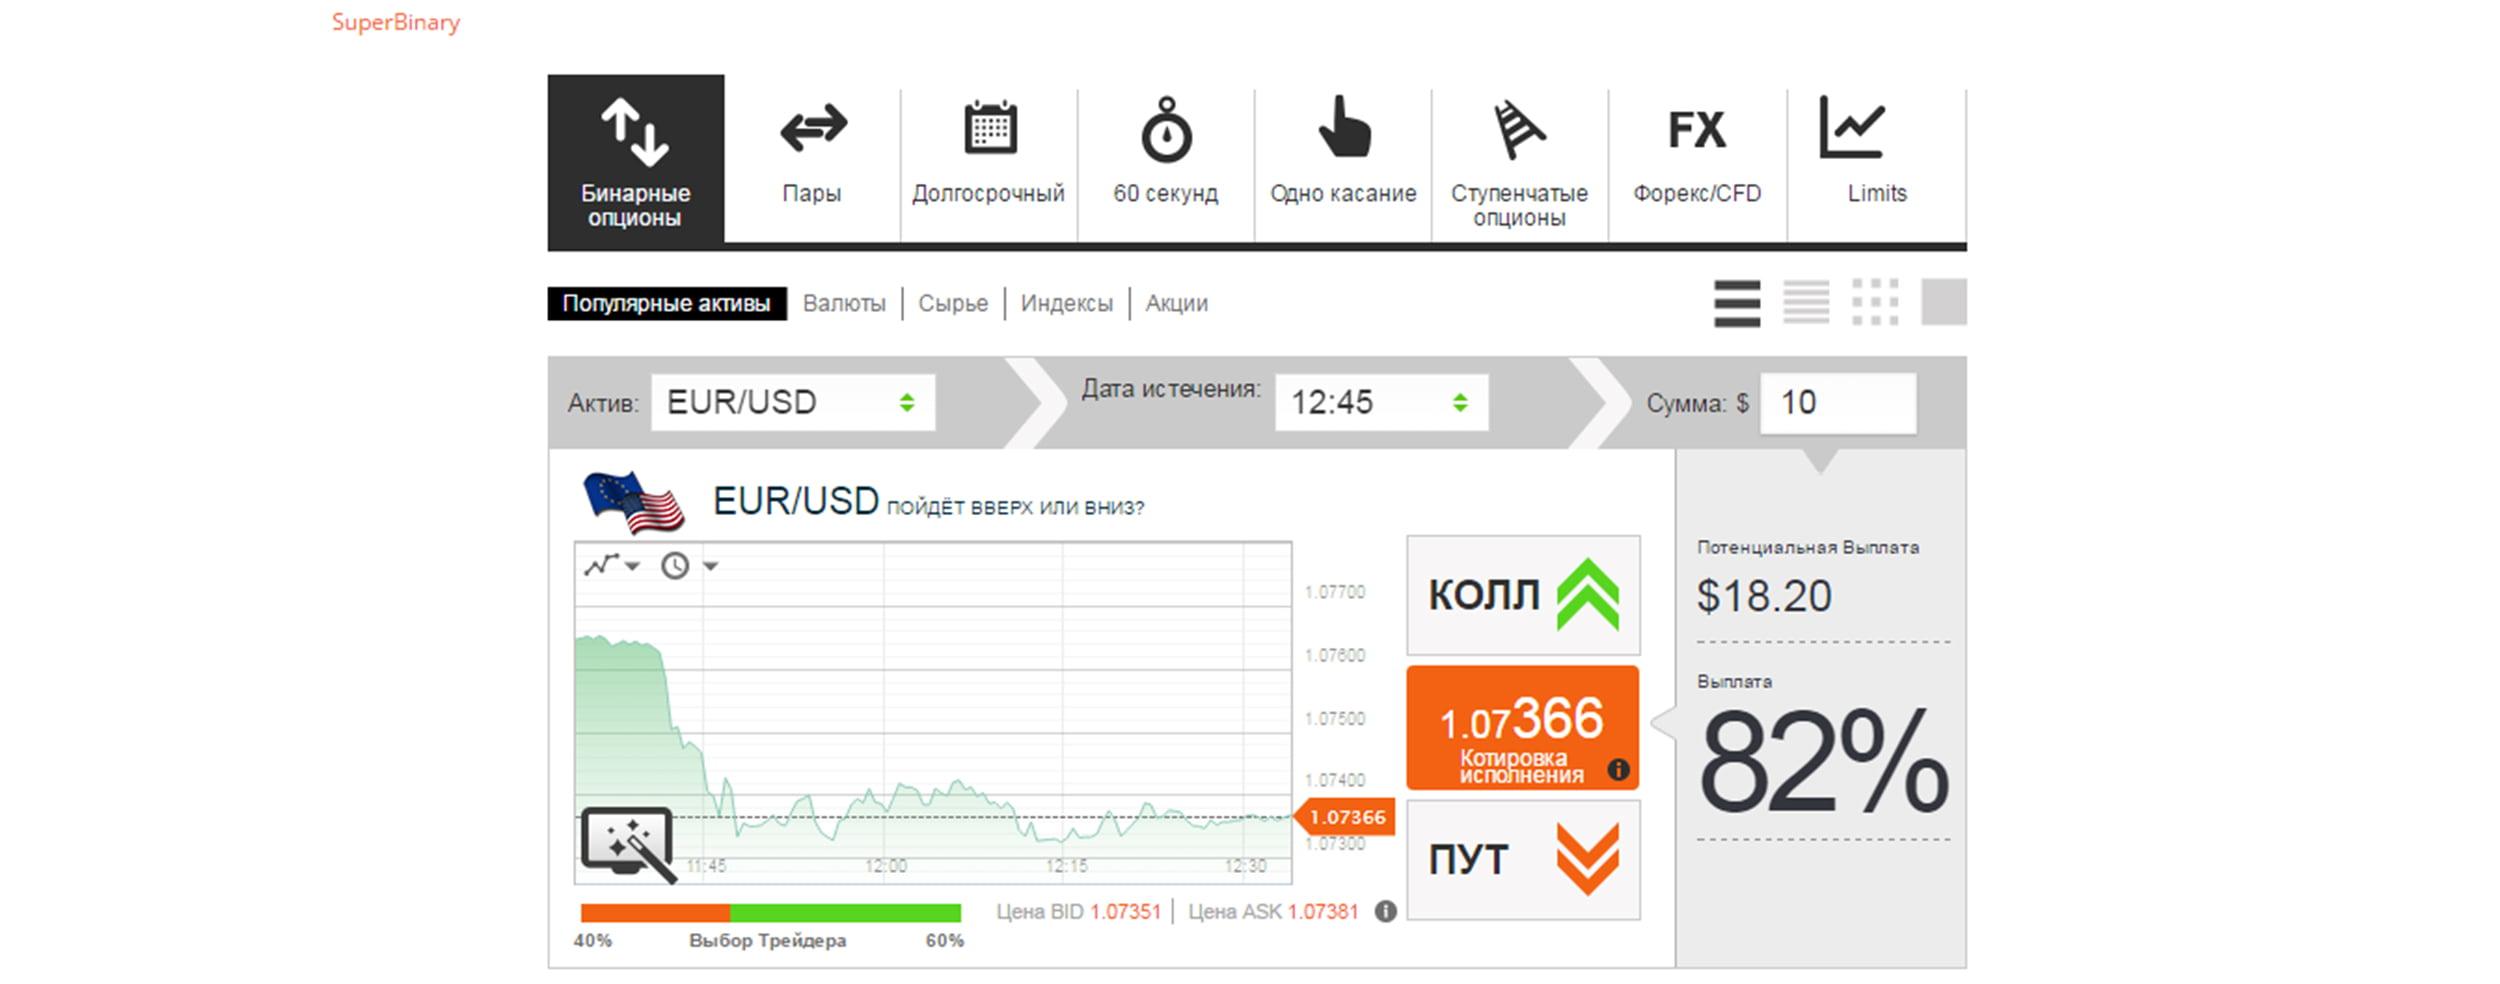 Торговая платформа SpotOption у брокера SuperBinary